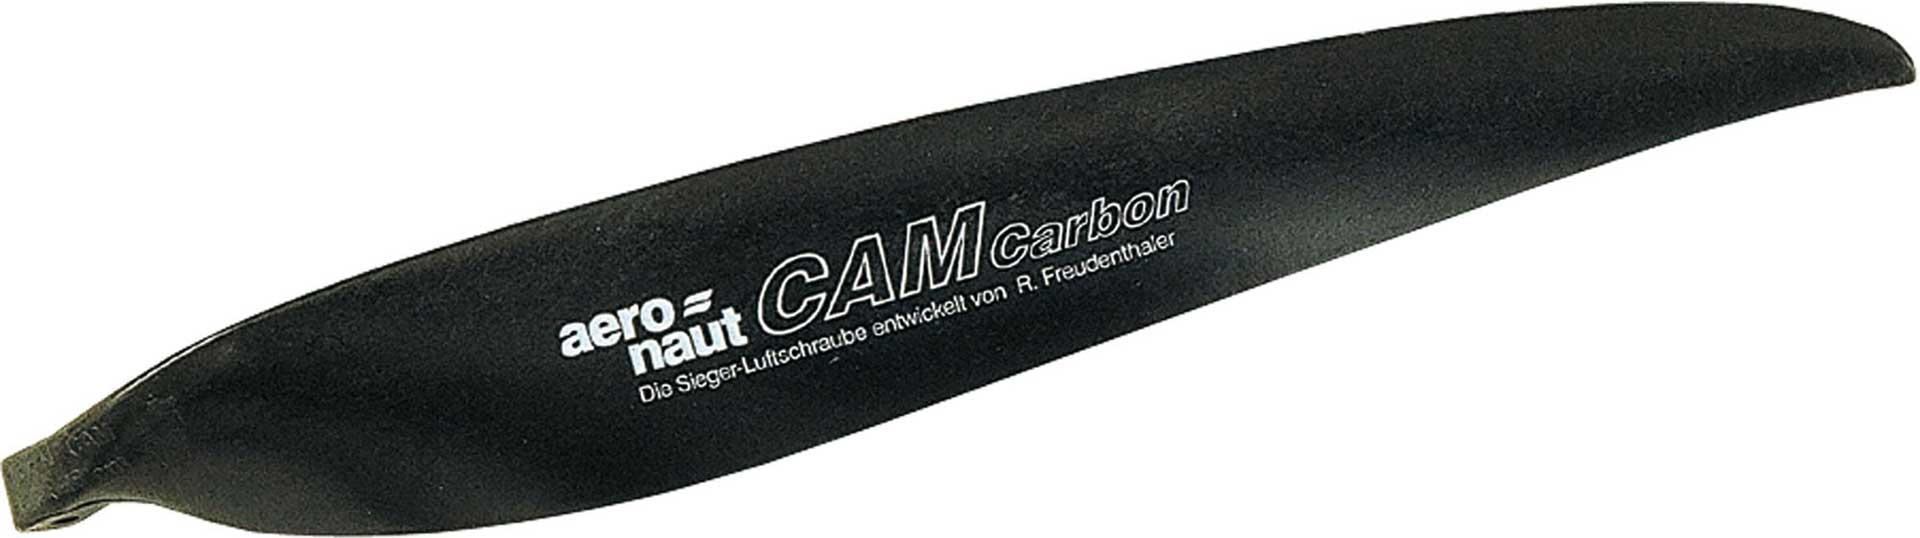 AERONAUT CAM-CARBON SPARE PROP BLADE 10/6